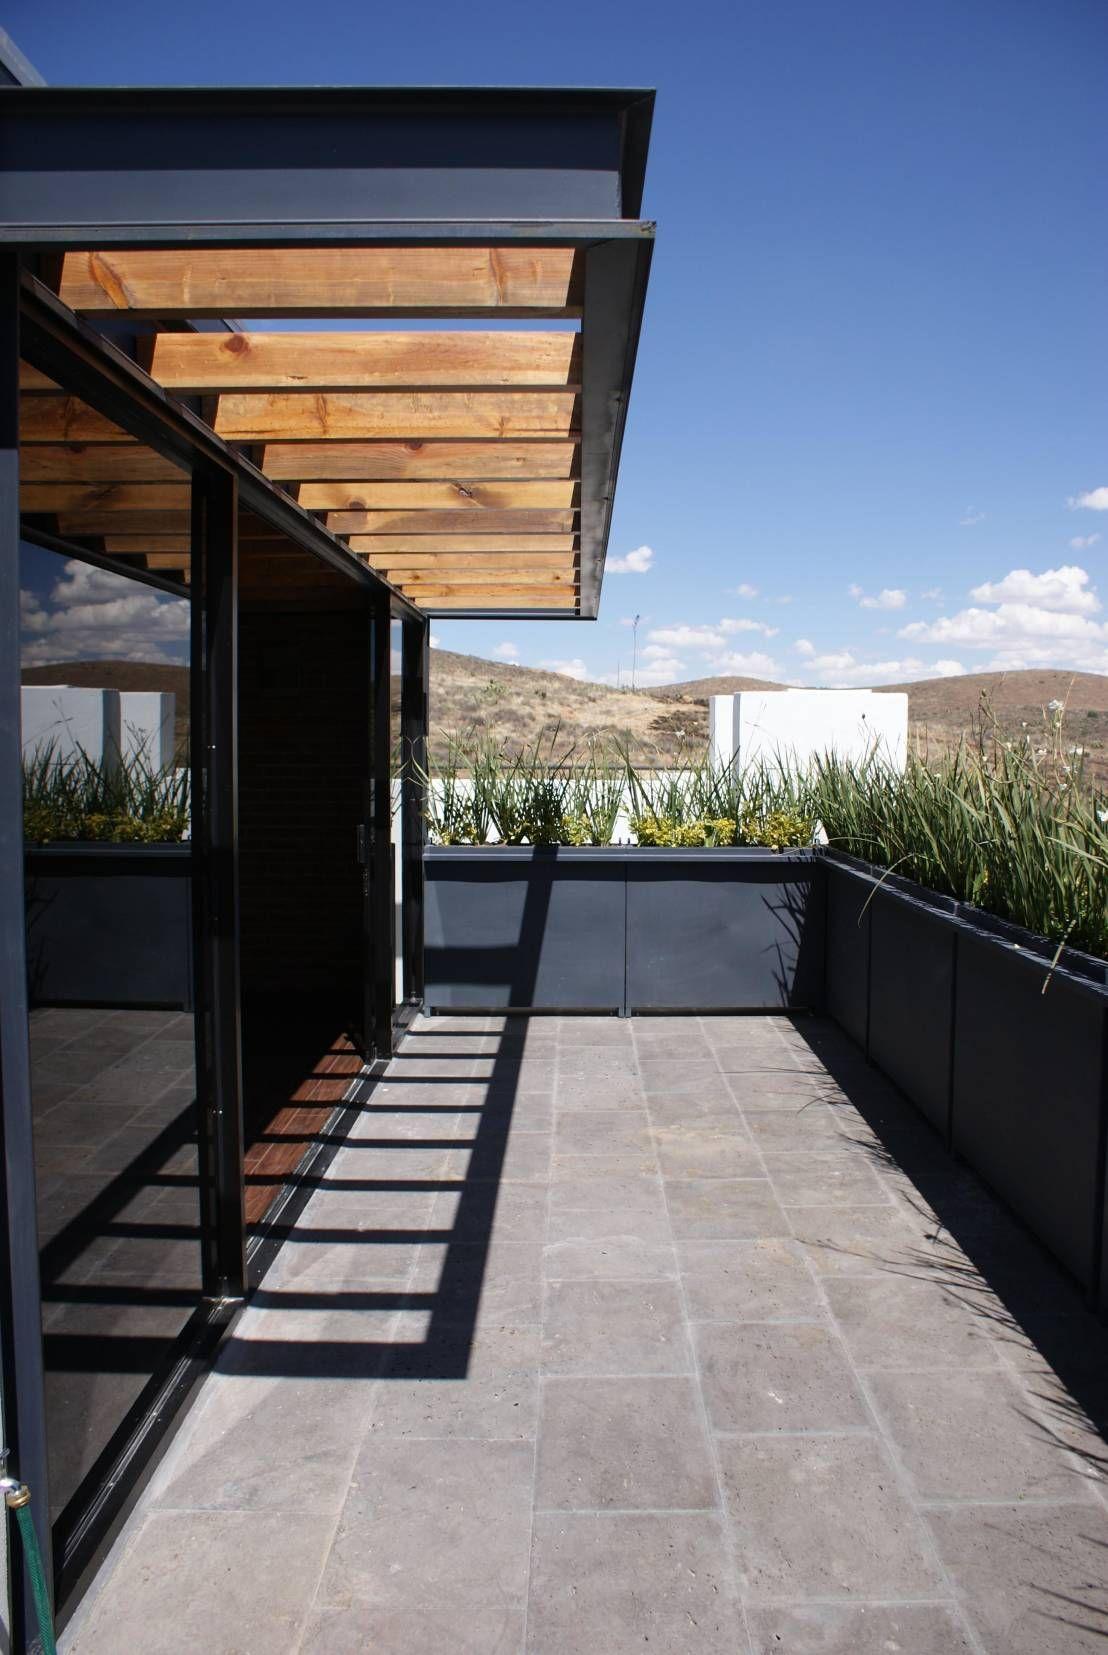 Balcones 10 ideas frescas y modernas pergolas for Terrazas minimalistas modernas